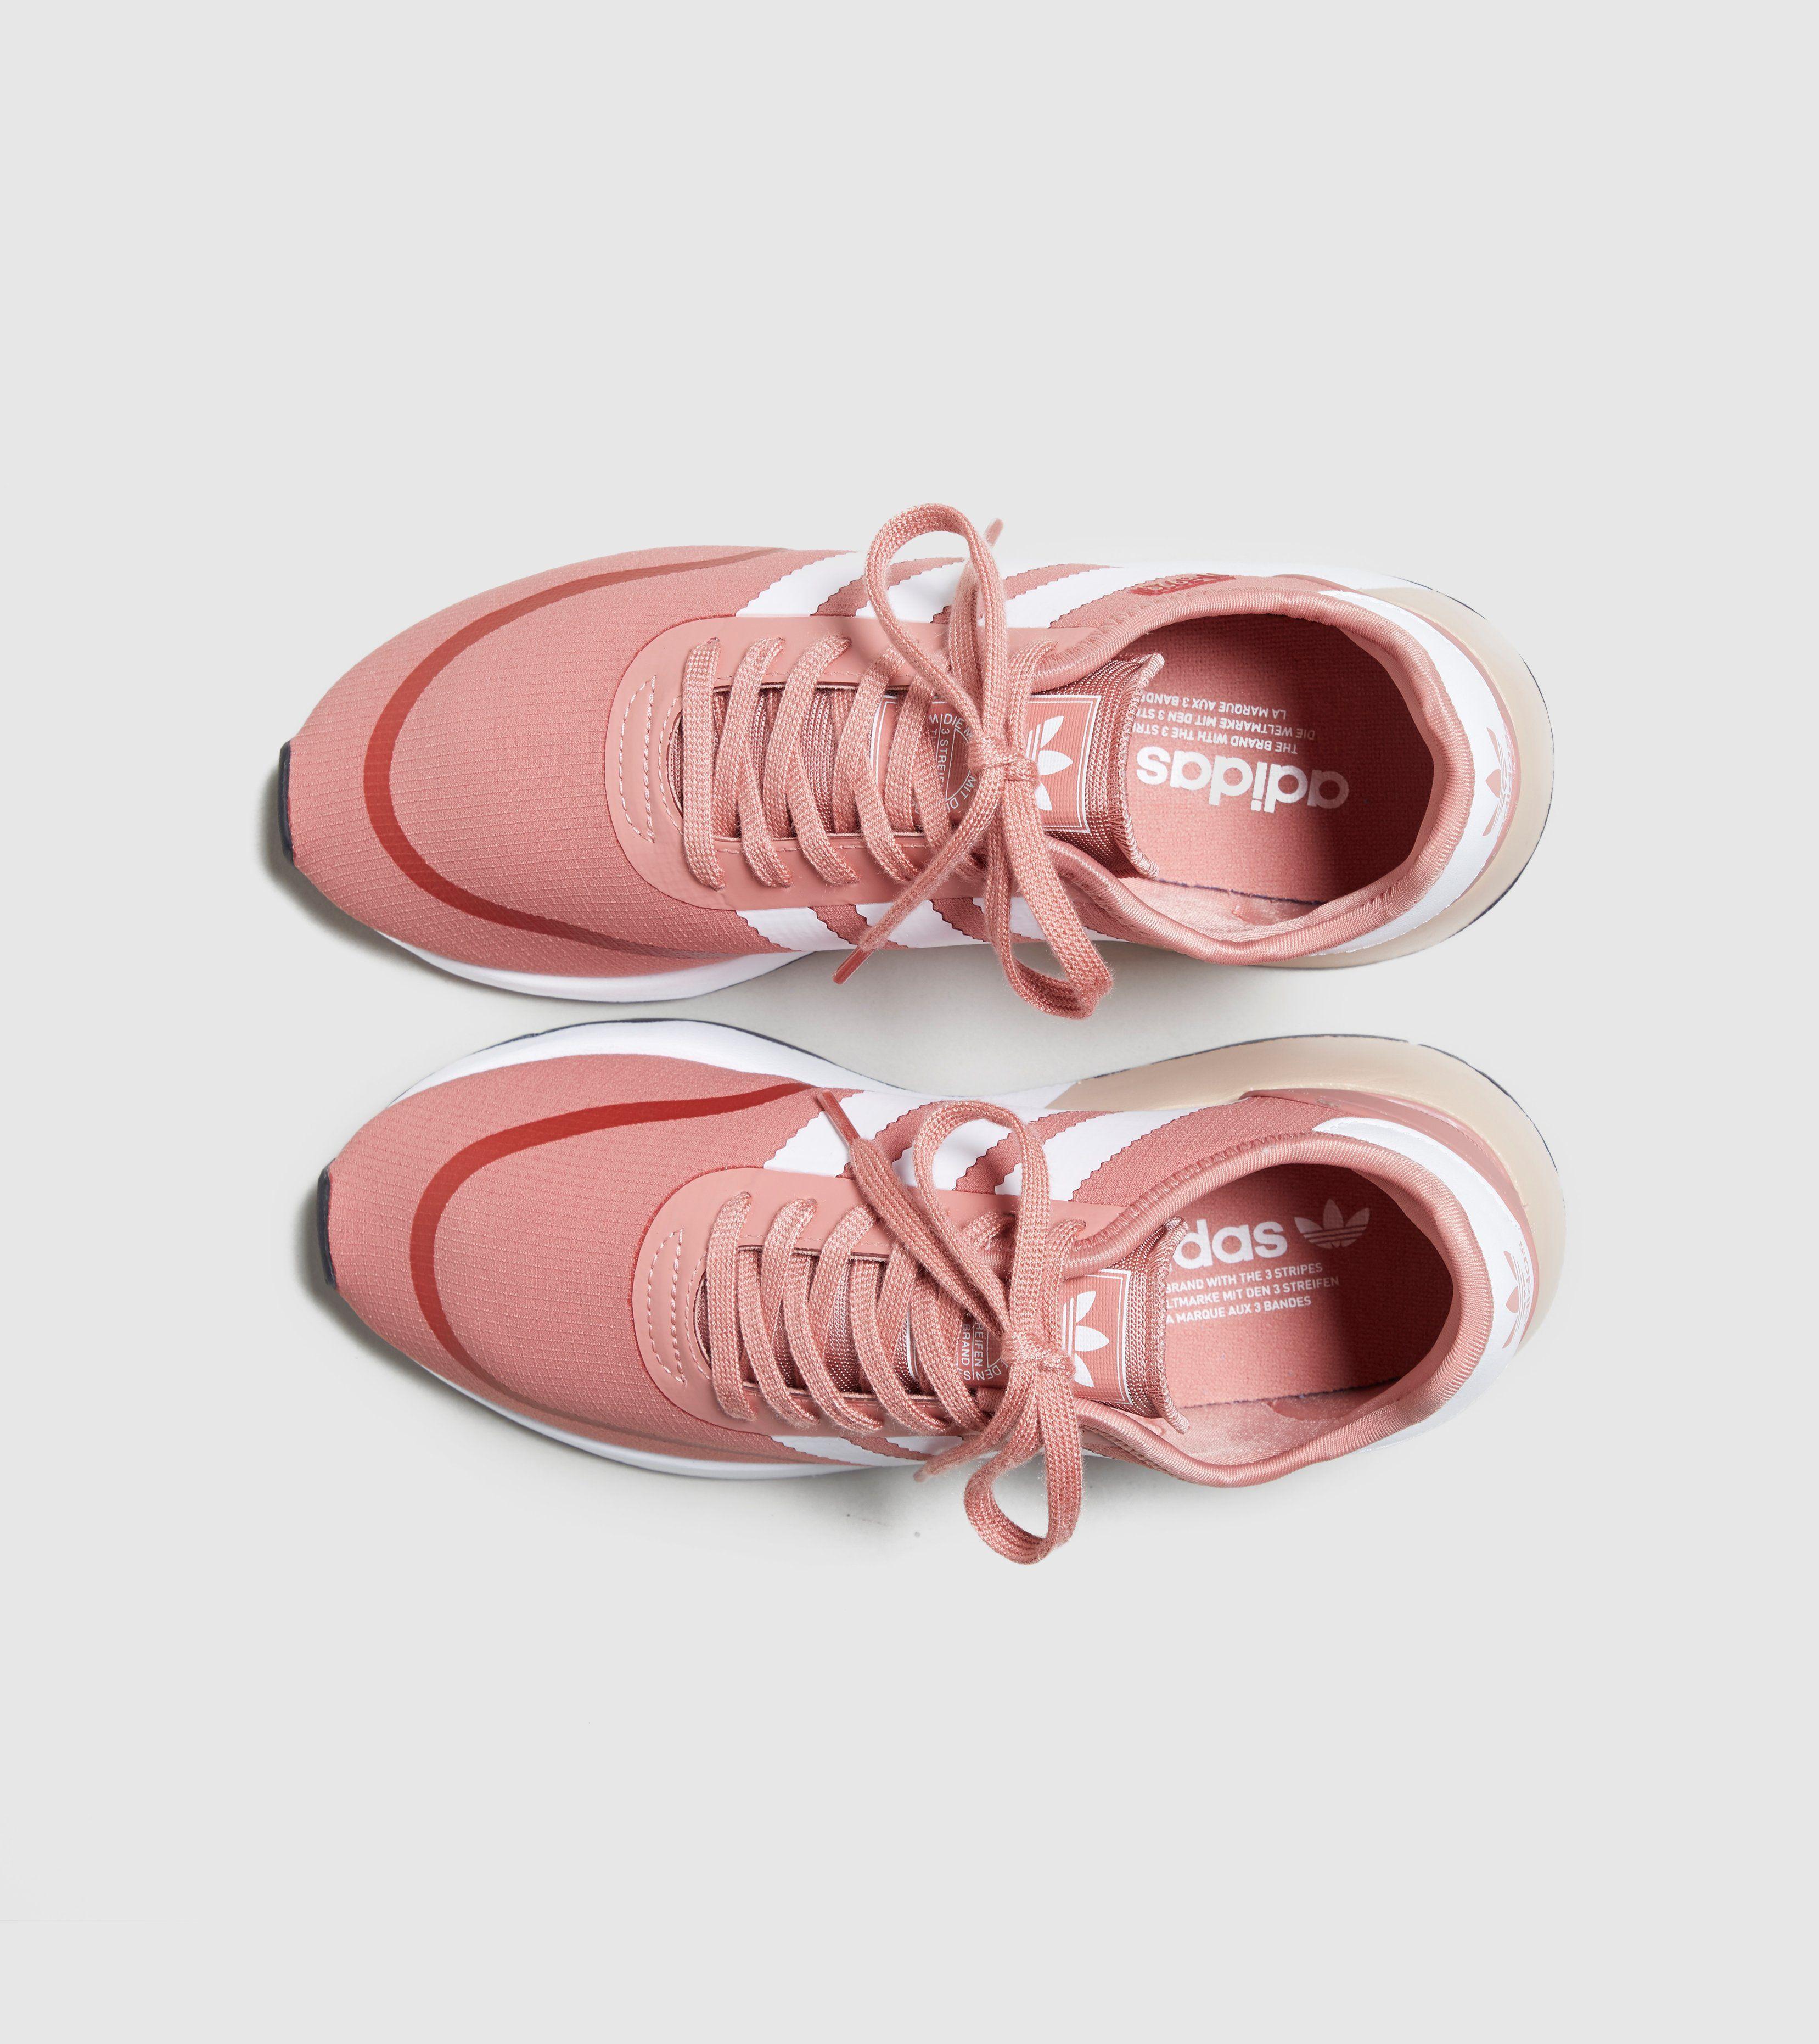 adidas Originals N-5923 Women's